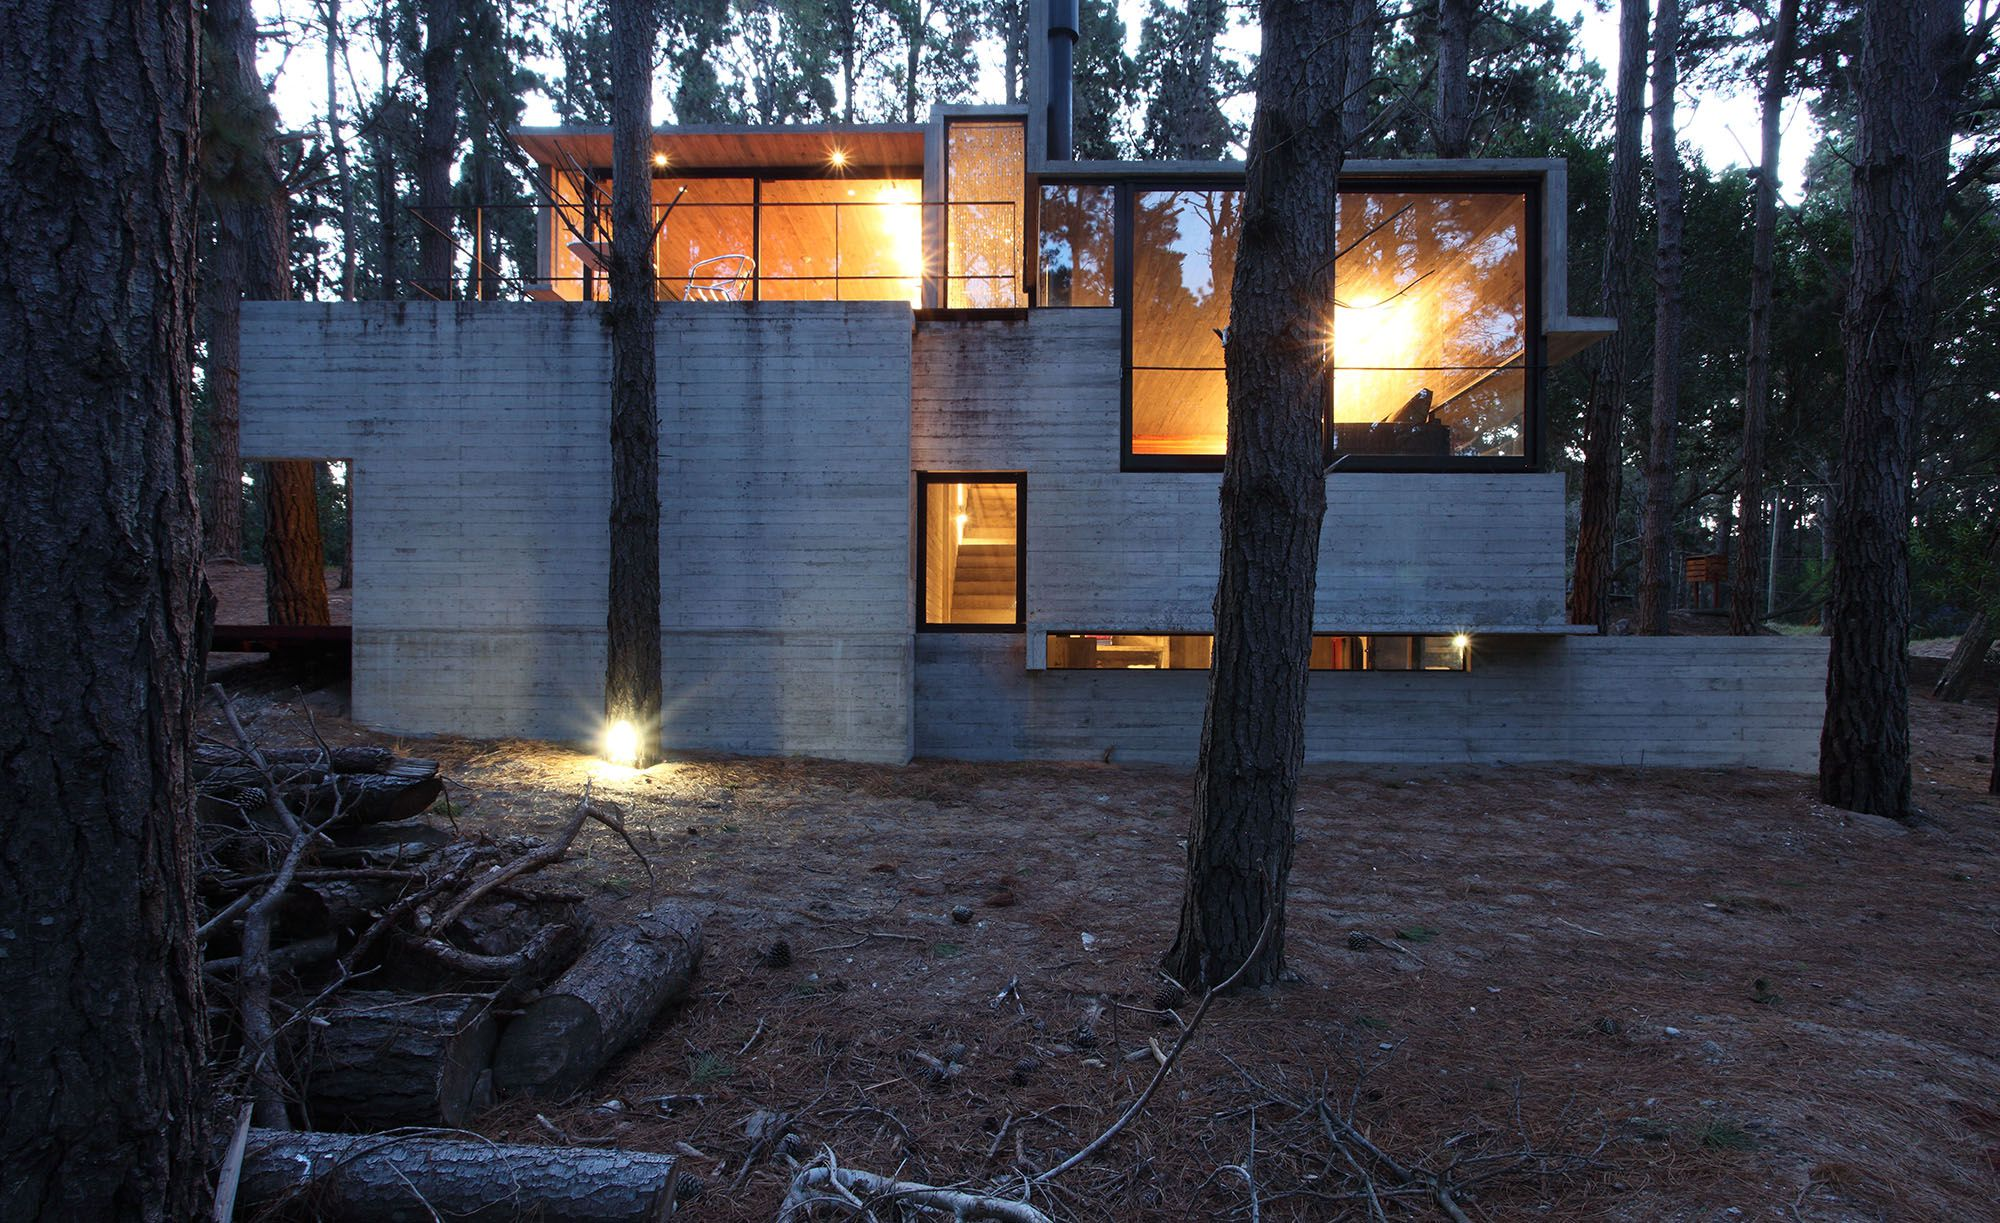 Casa levels by mar a victoria beson asa and luciano kruk for Casa minimalista bosque